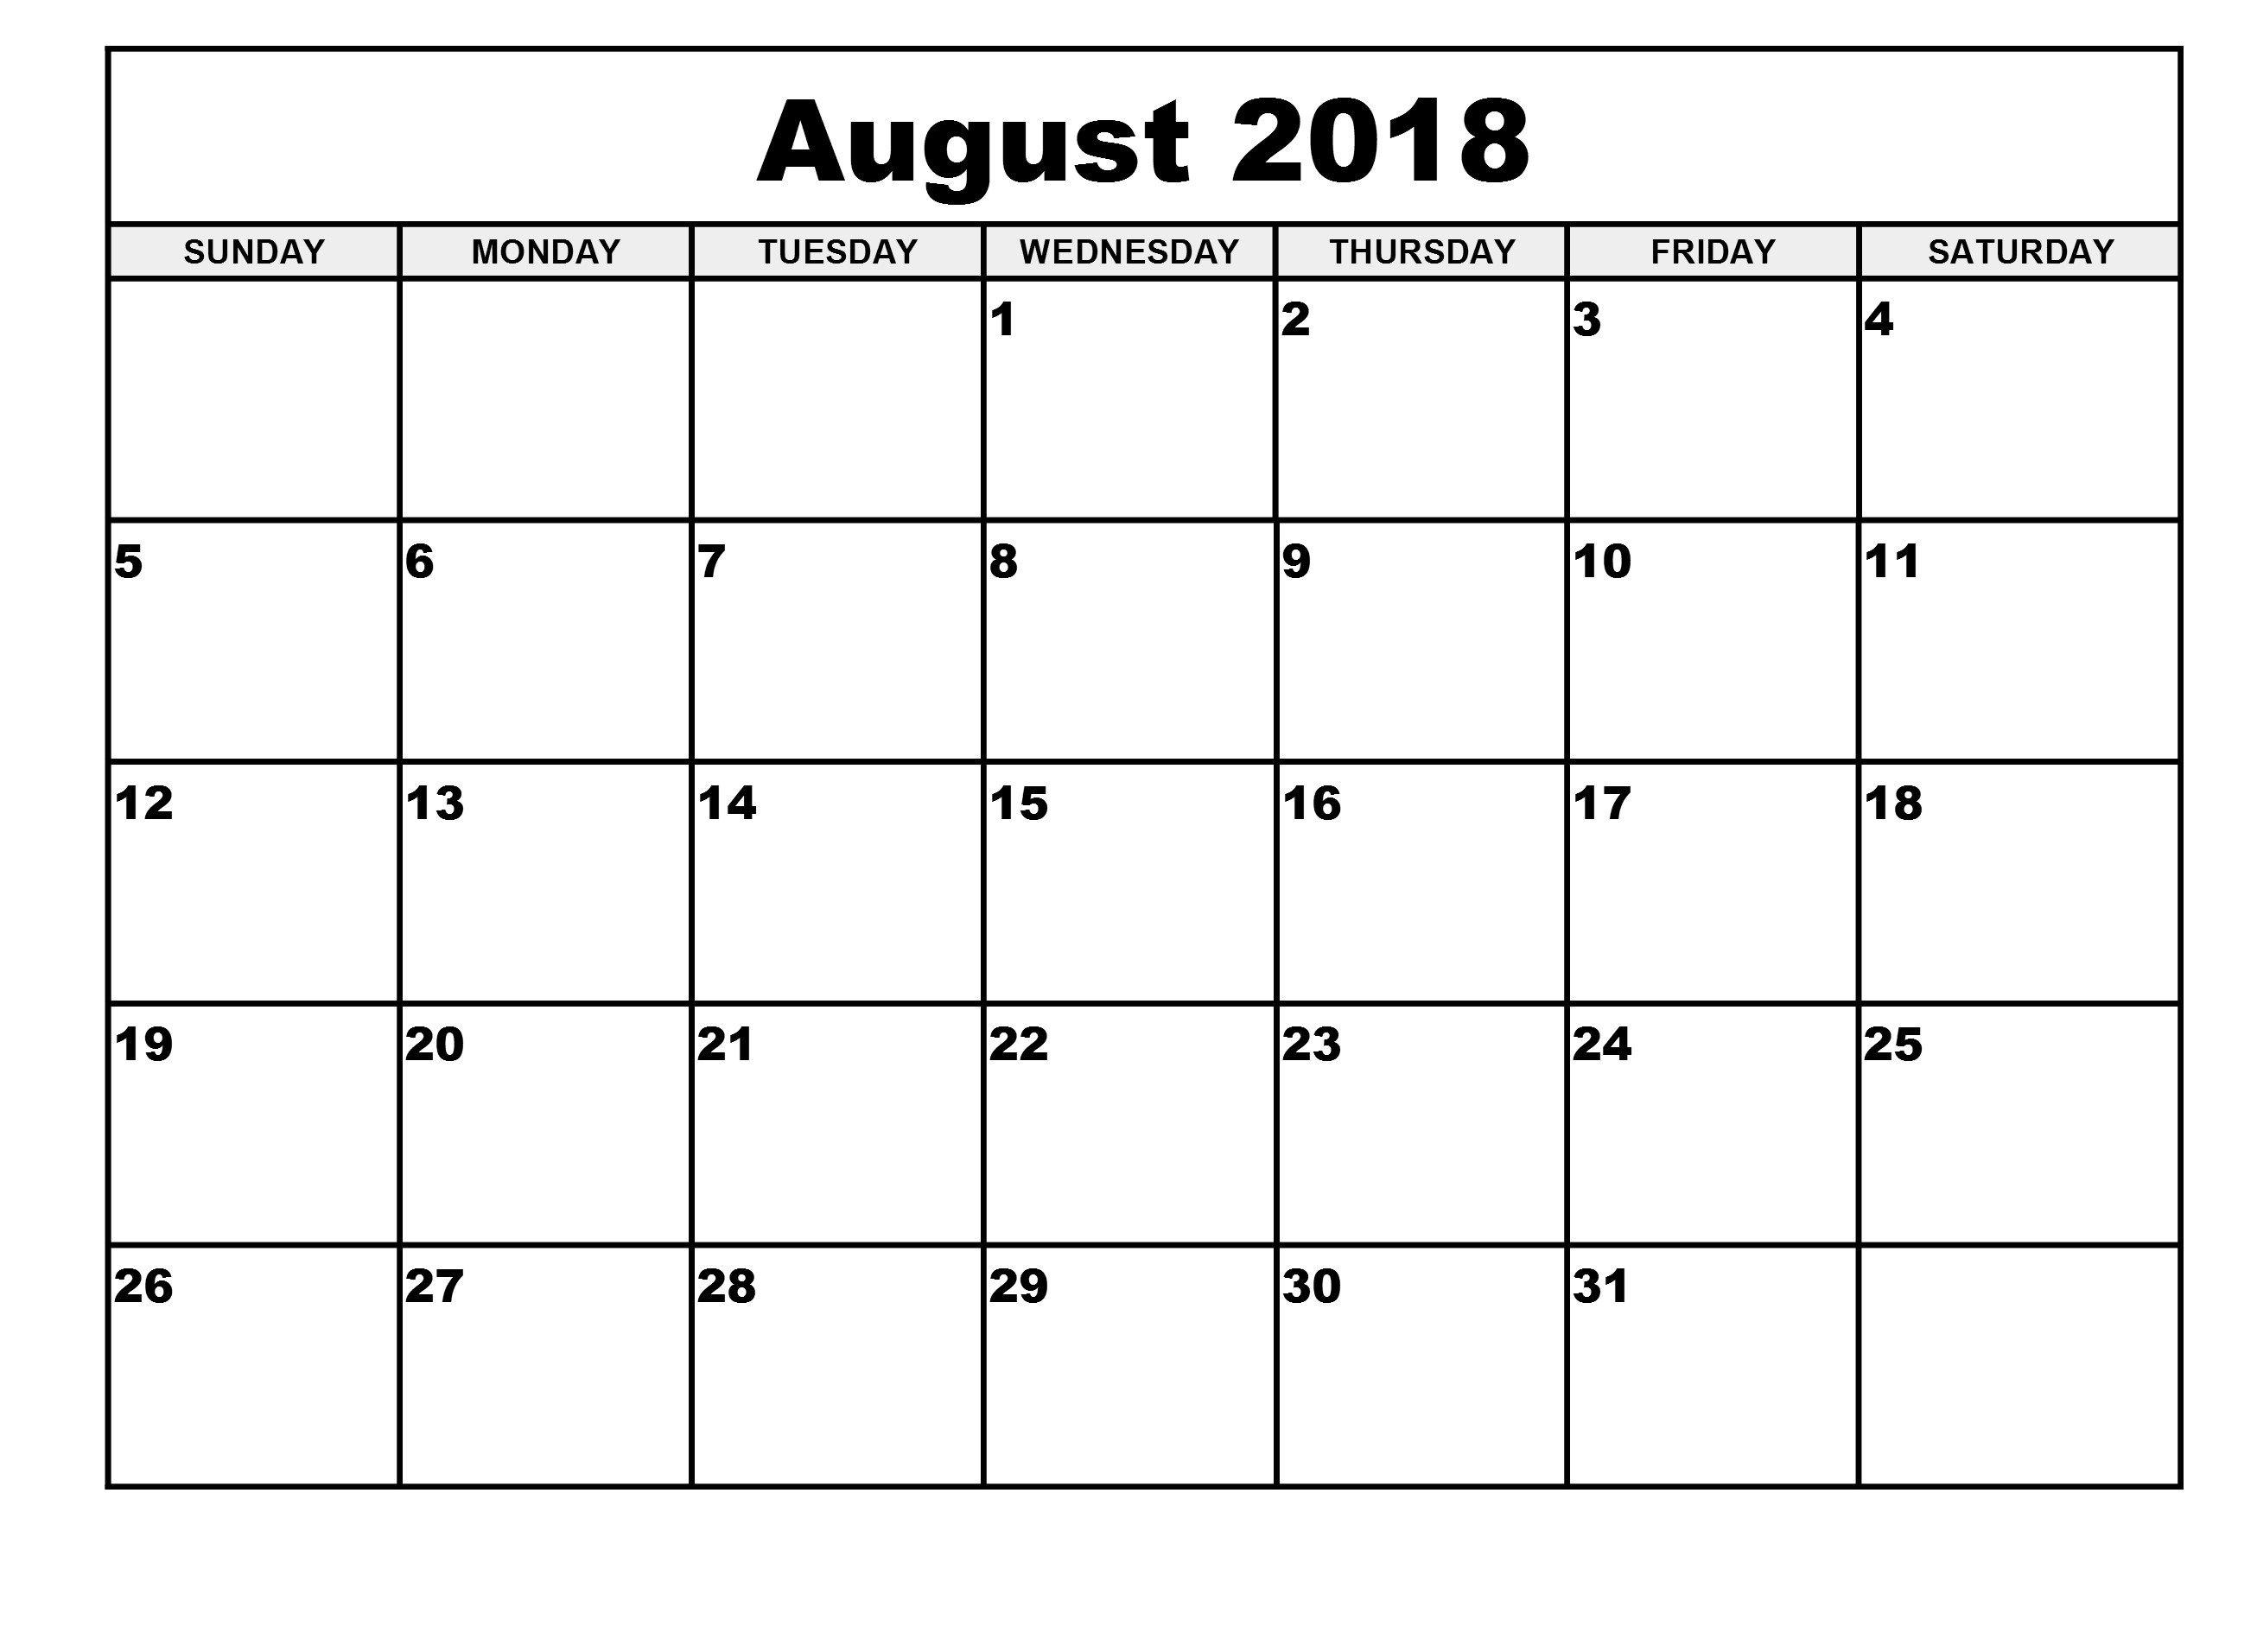 Pin By Raghuveer Singh On August 2018 Calendar Pinterest